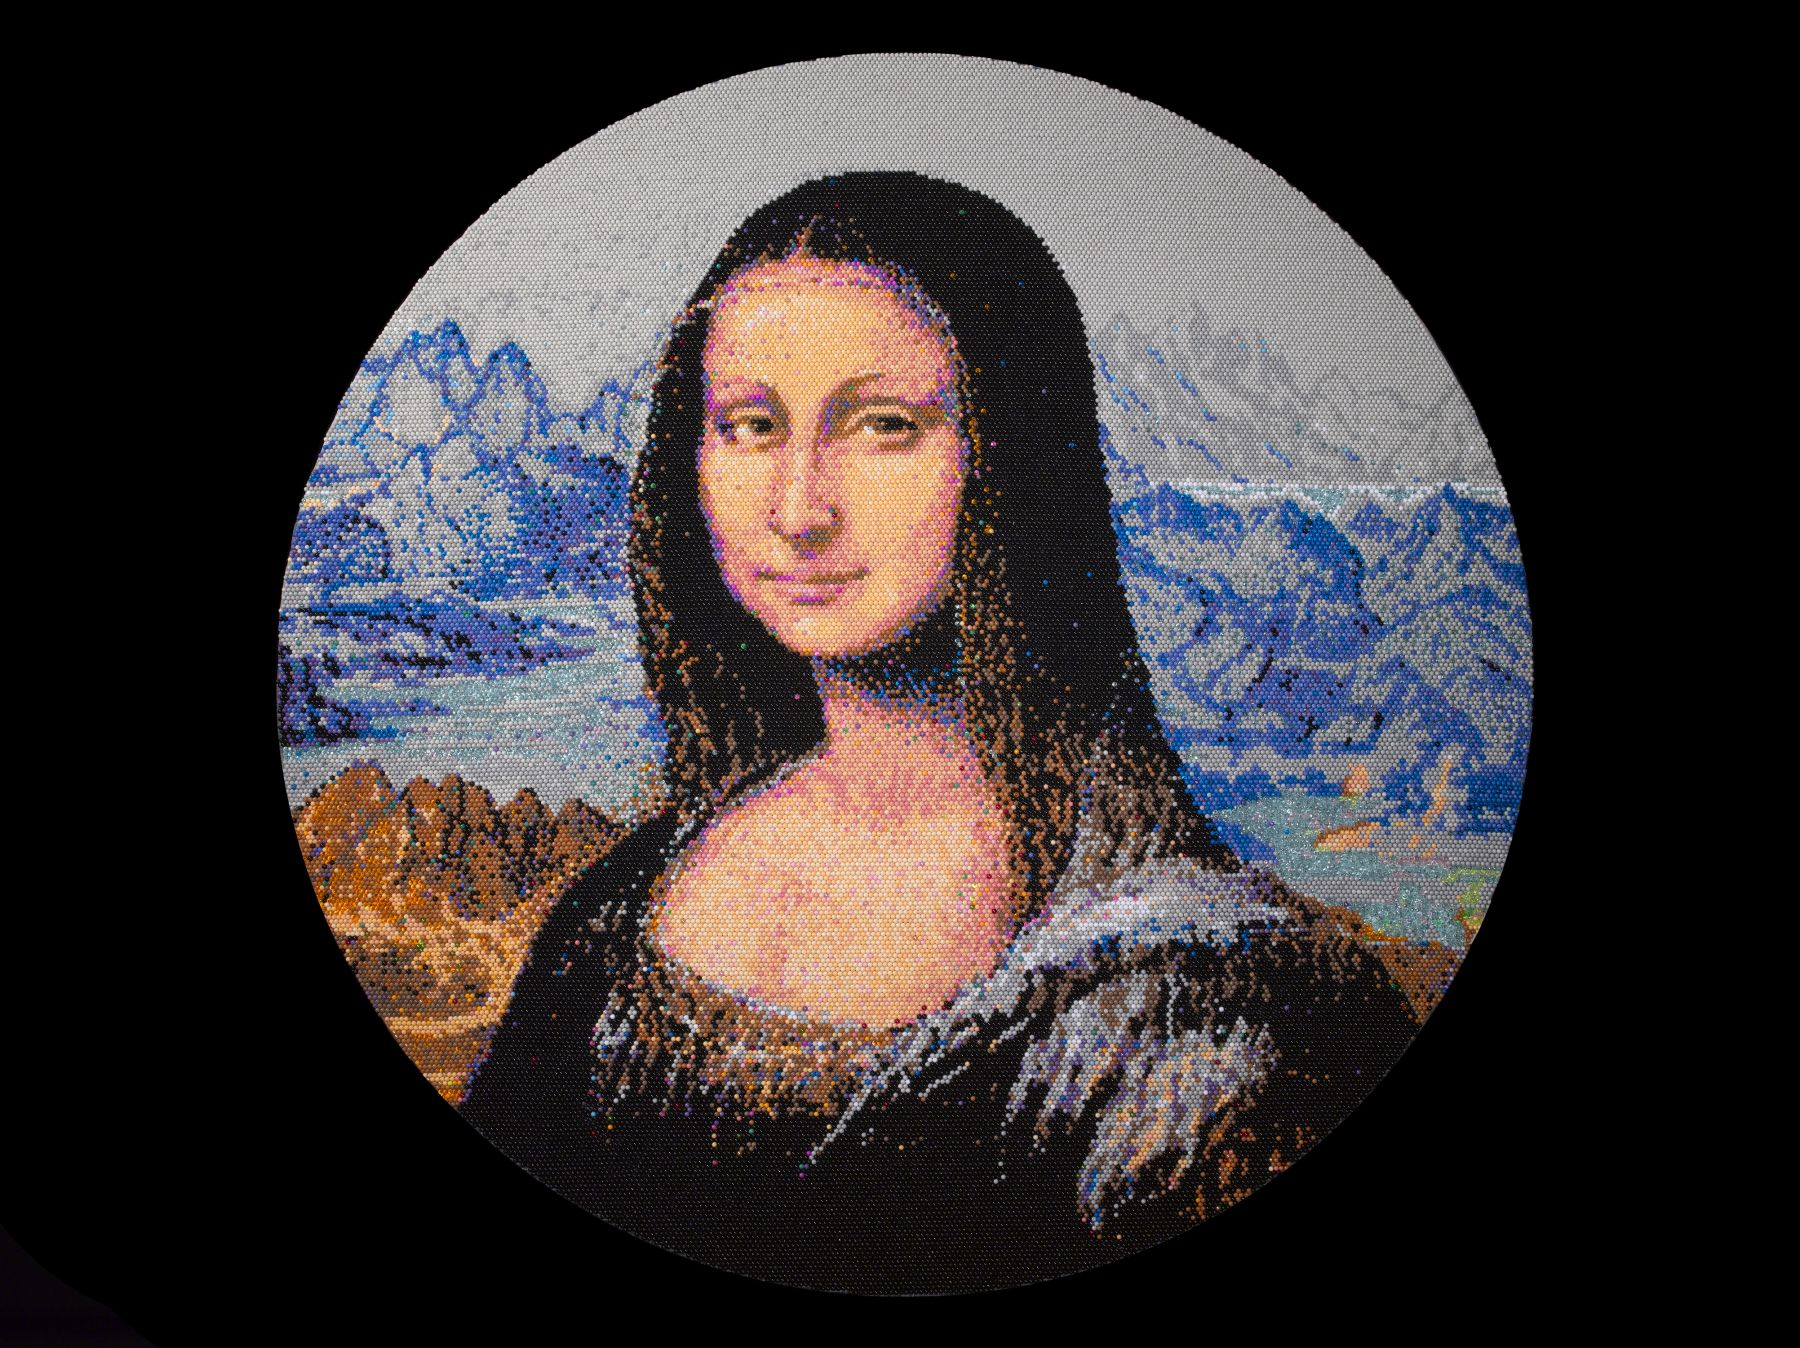 david mach, Mona Lisa, 2013, pushpins, 39 1/4 inches diameter